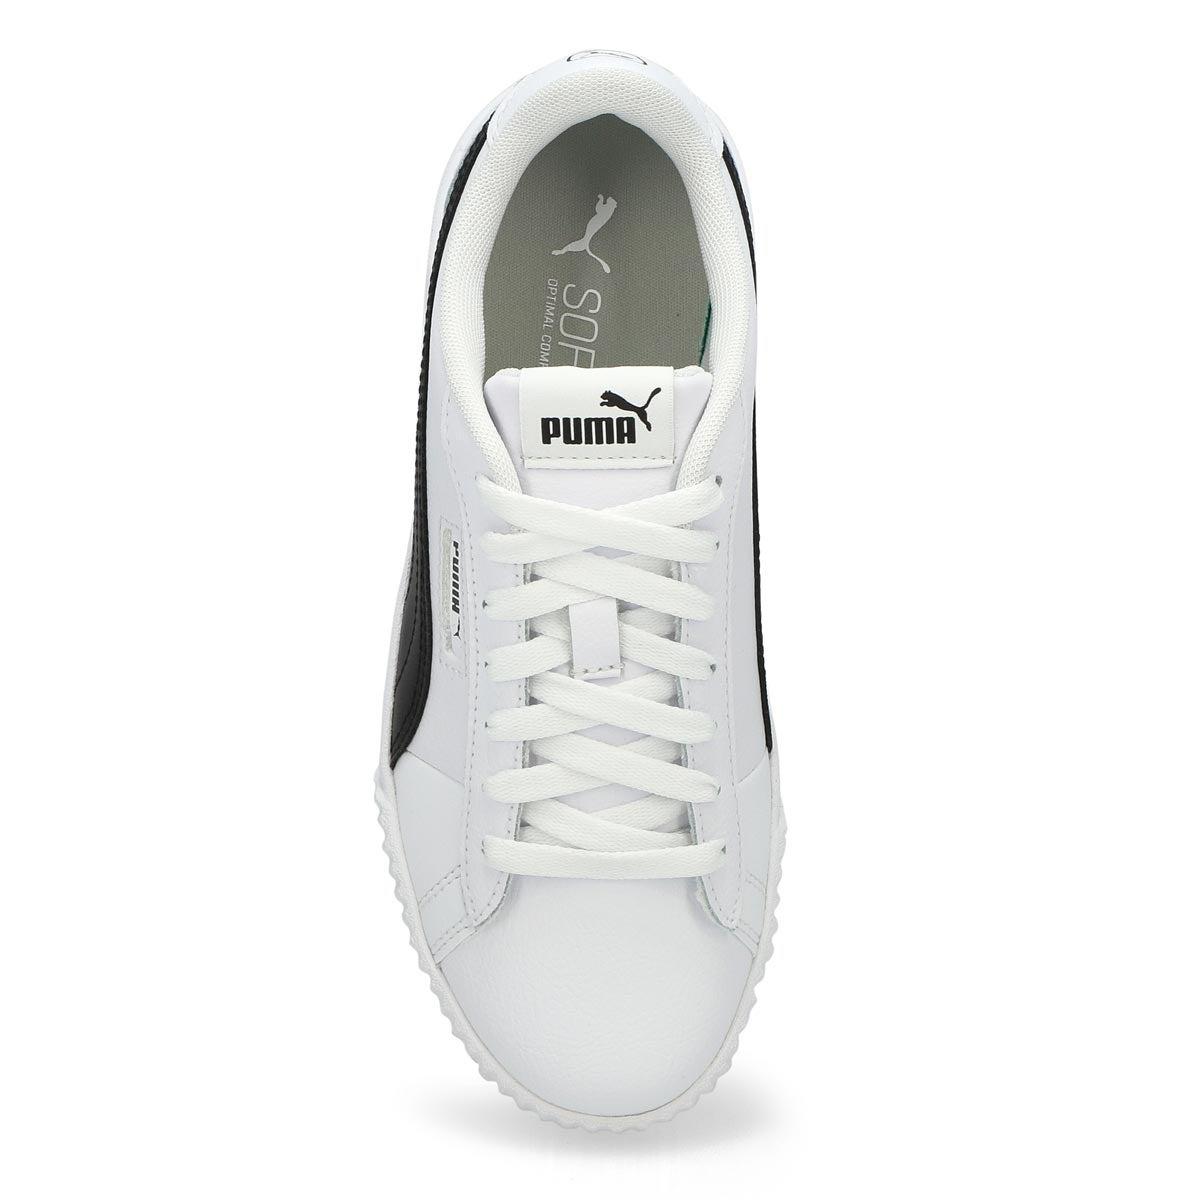 Women's Carina Crew Sneaker - White /Black